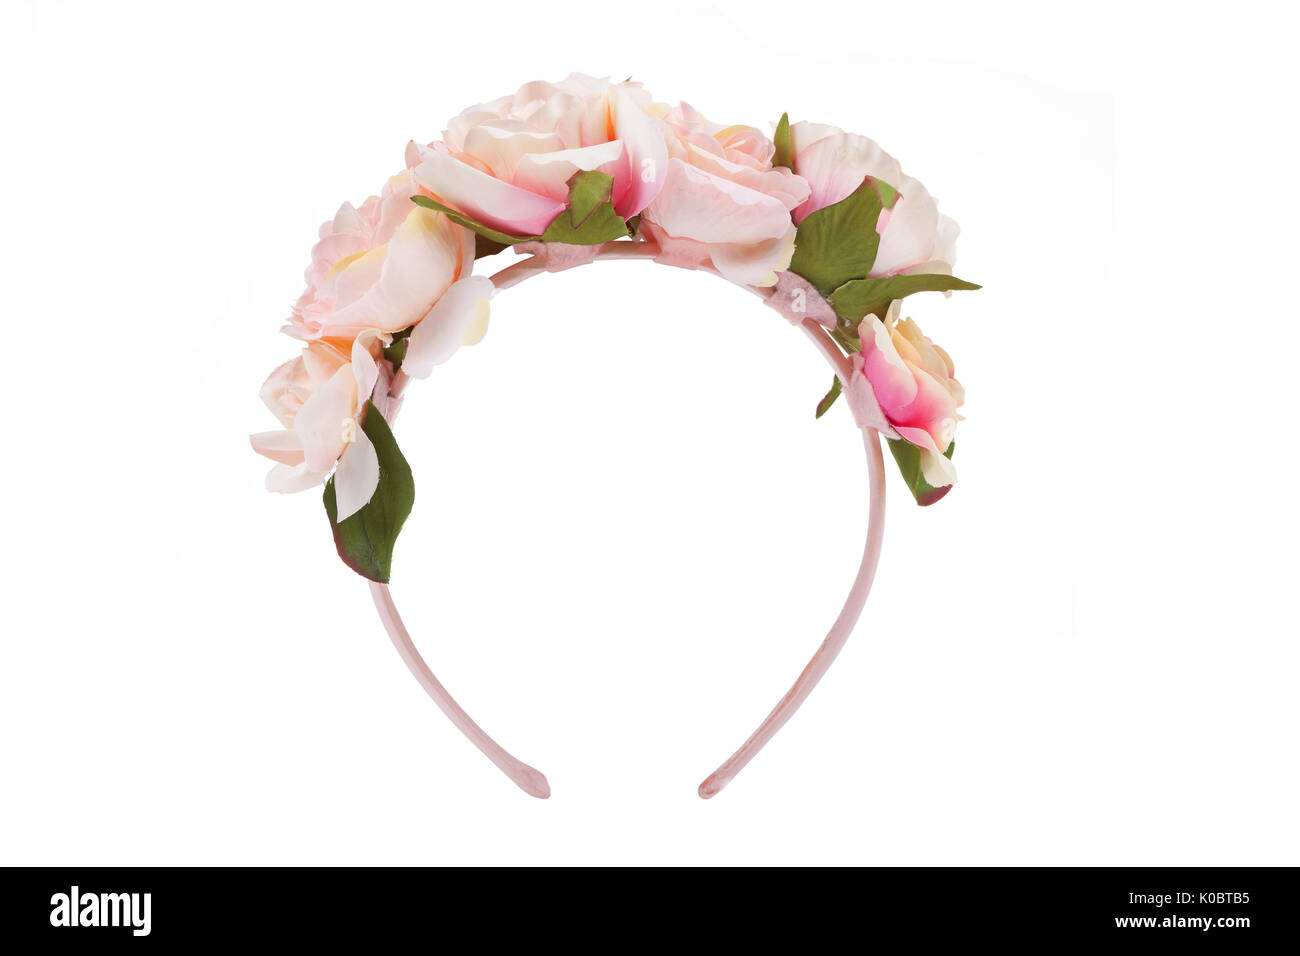 Flower wreath isolated on white - Stock Image